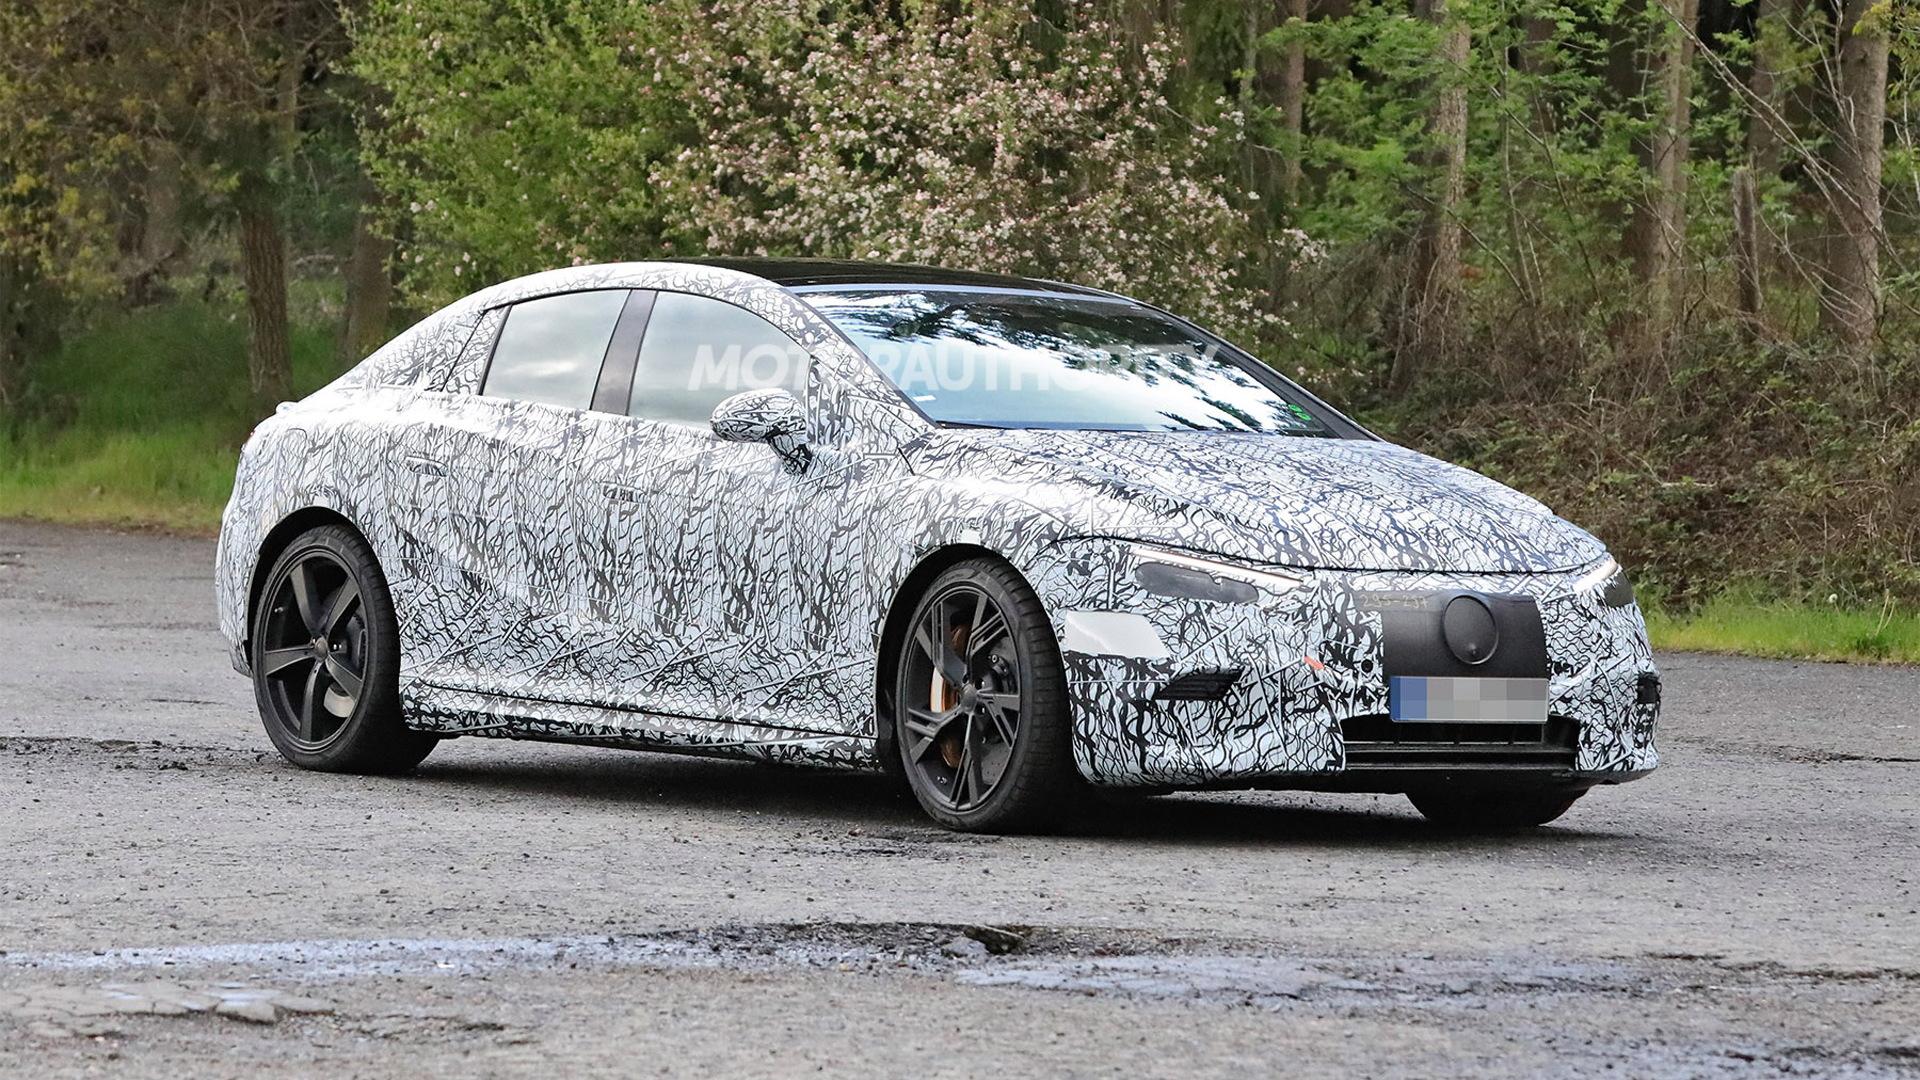 2023 Mercedes-Benz AMG EQE spy shots - Photo credit:S. Baldauf/SB-Medien